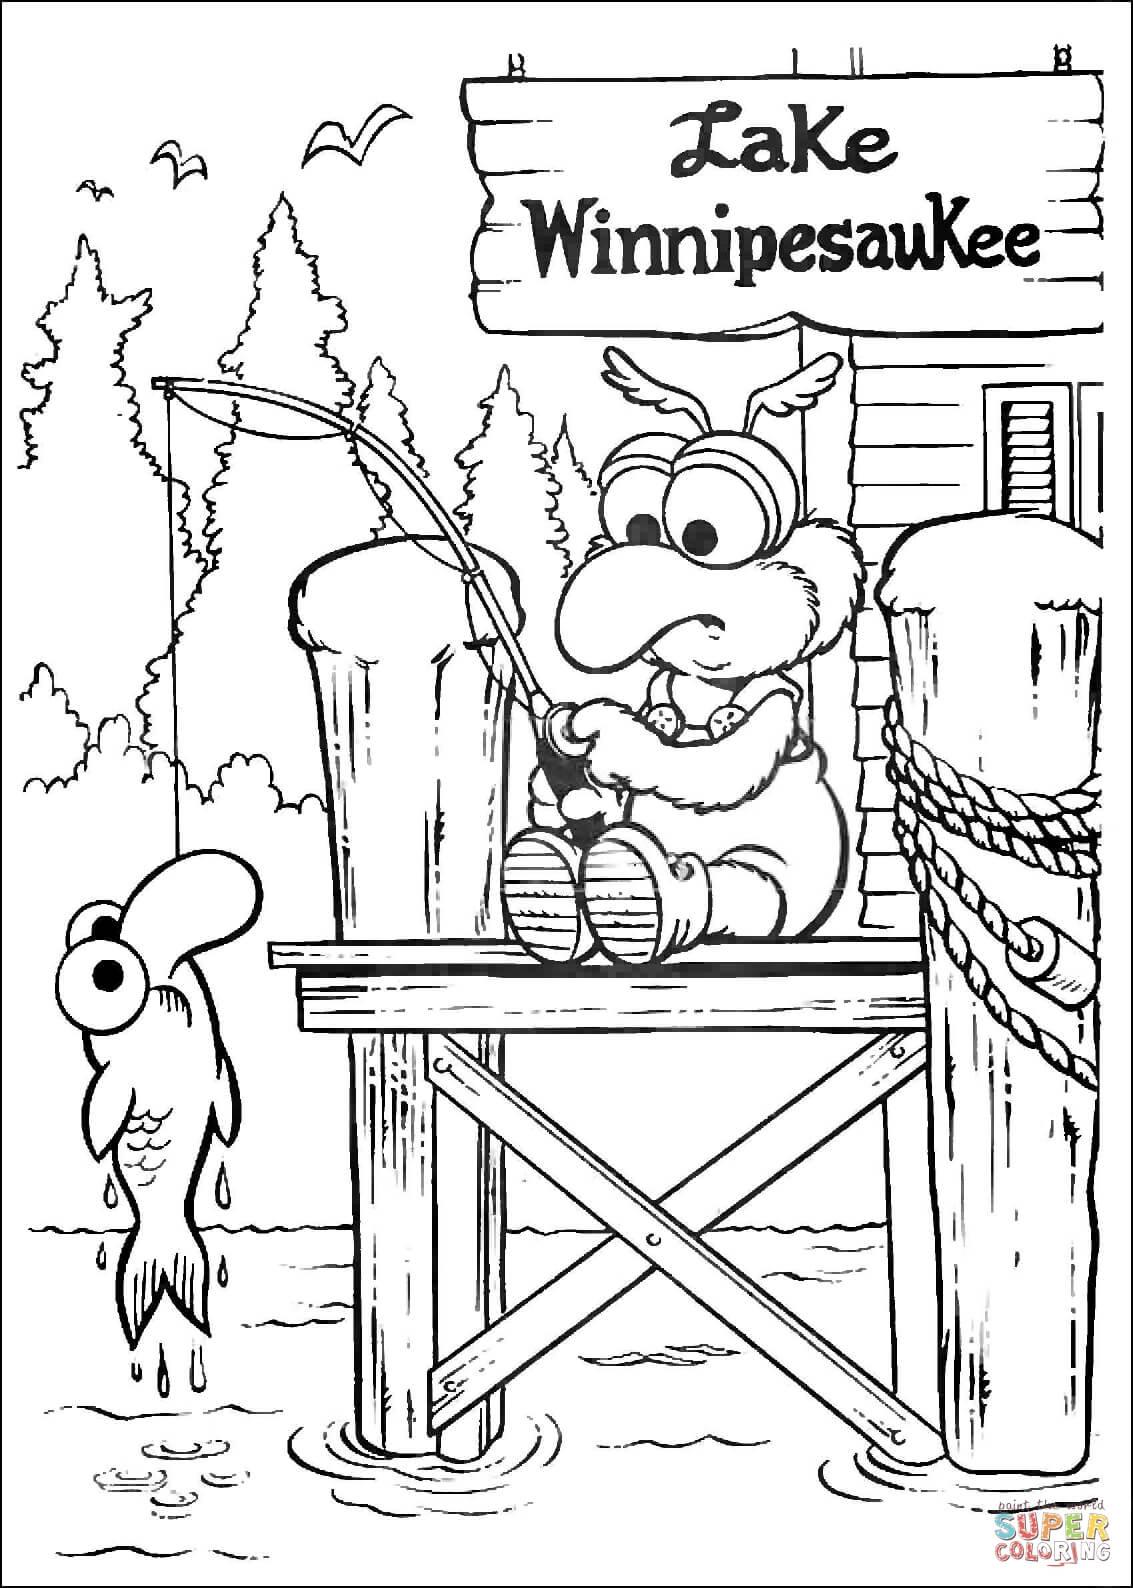 Baby Gonzo Is Fishing on Lake WinnipesauKee coloring page